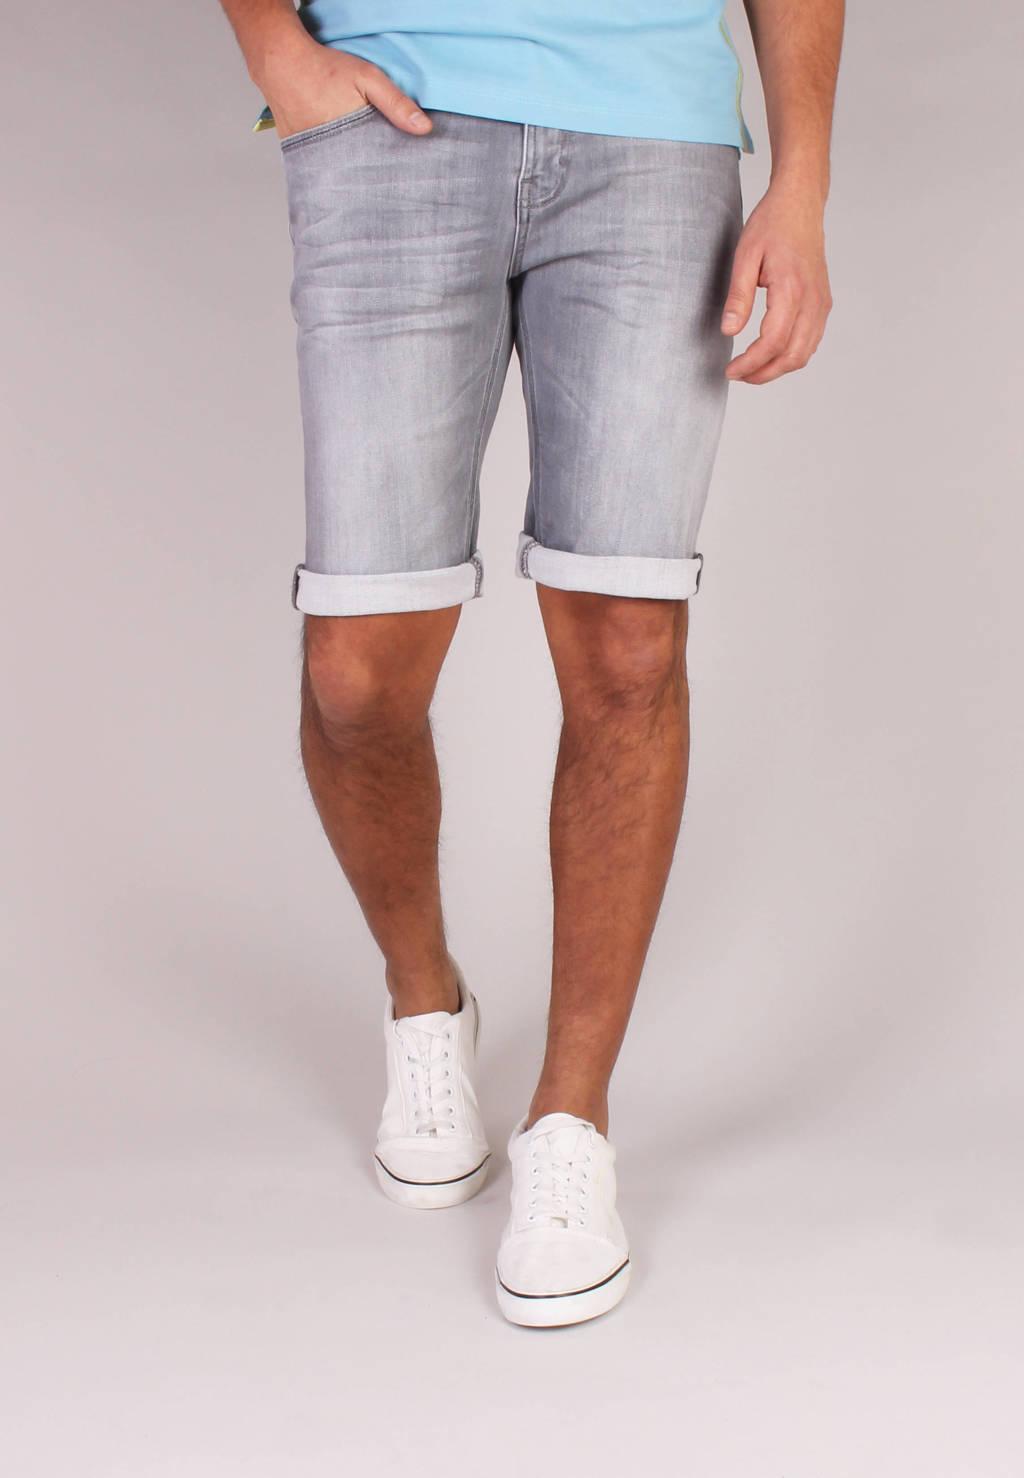 GABBIANO slim fit jeans short 82726 grey, Grey